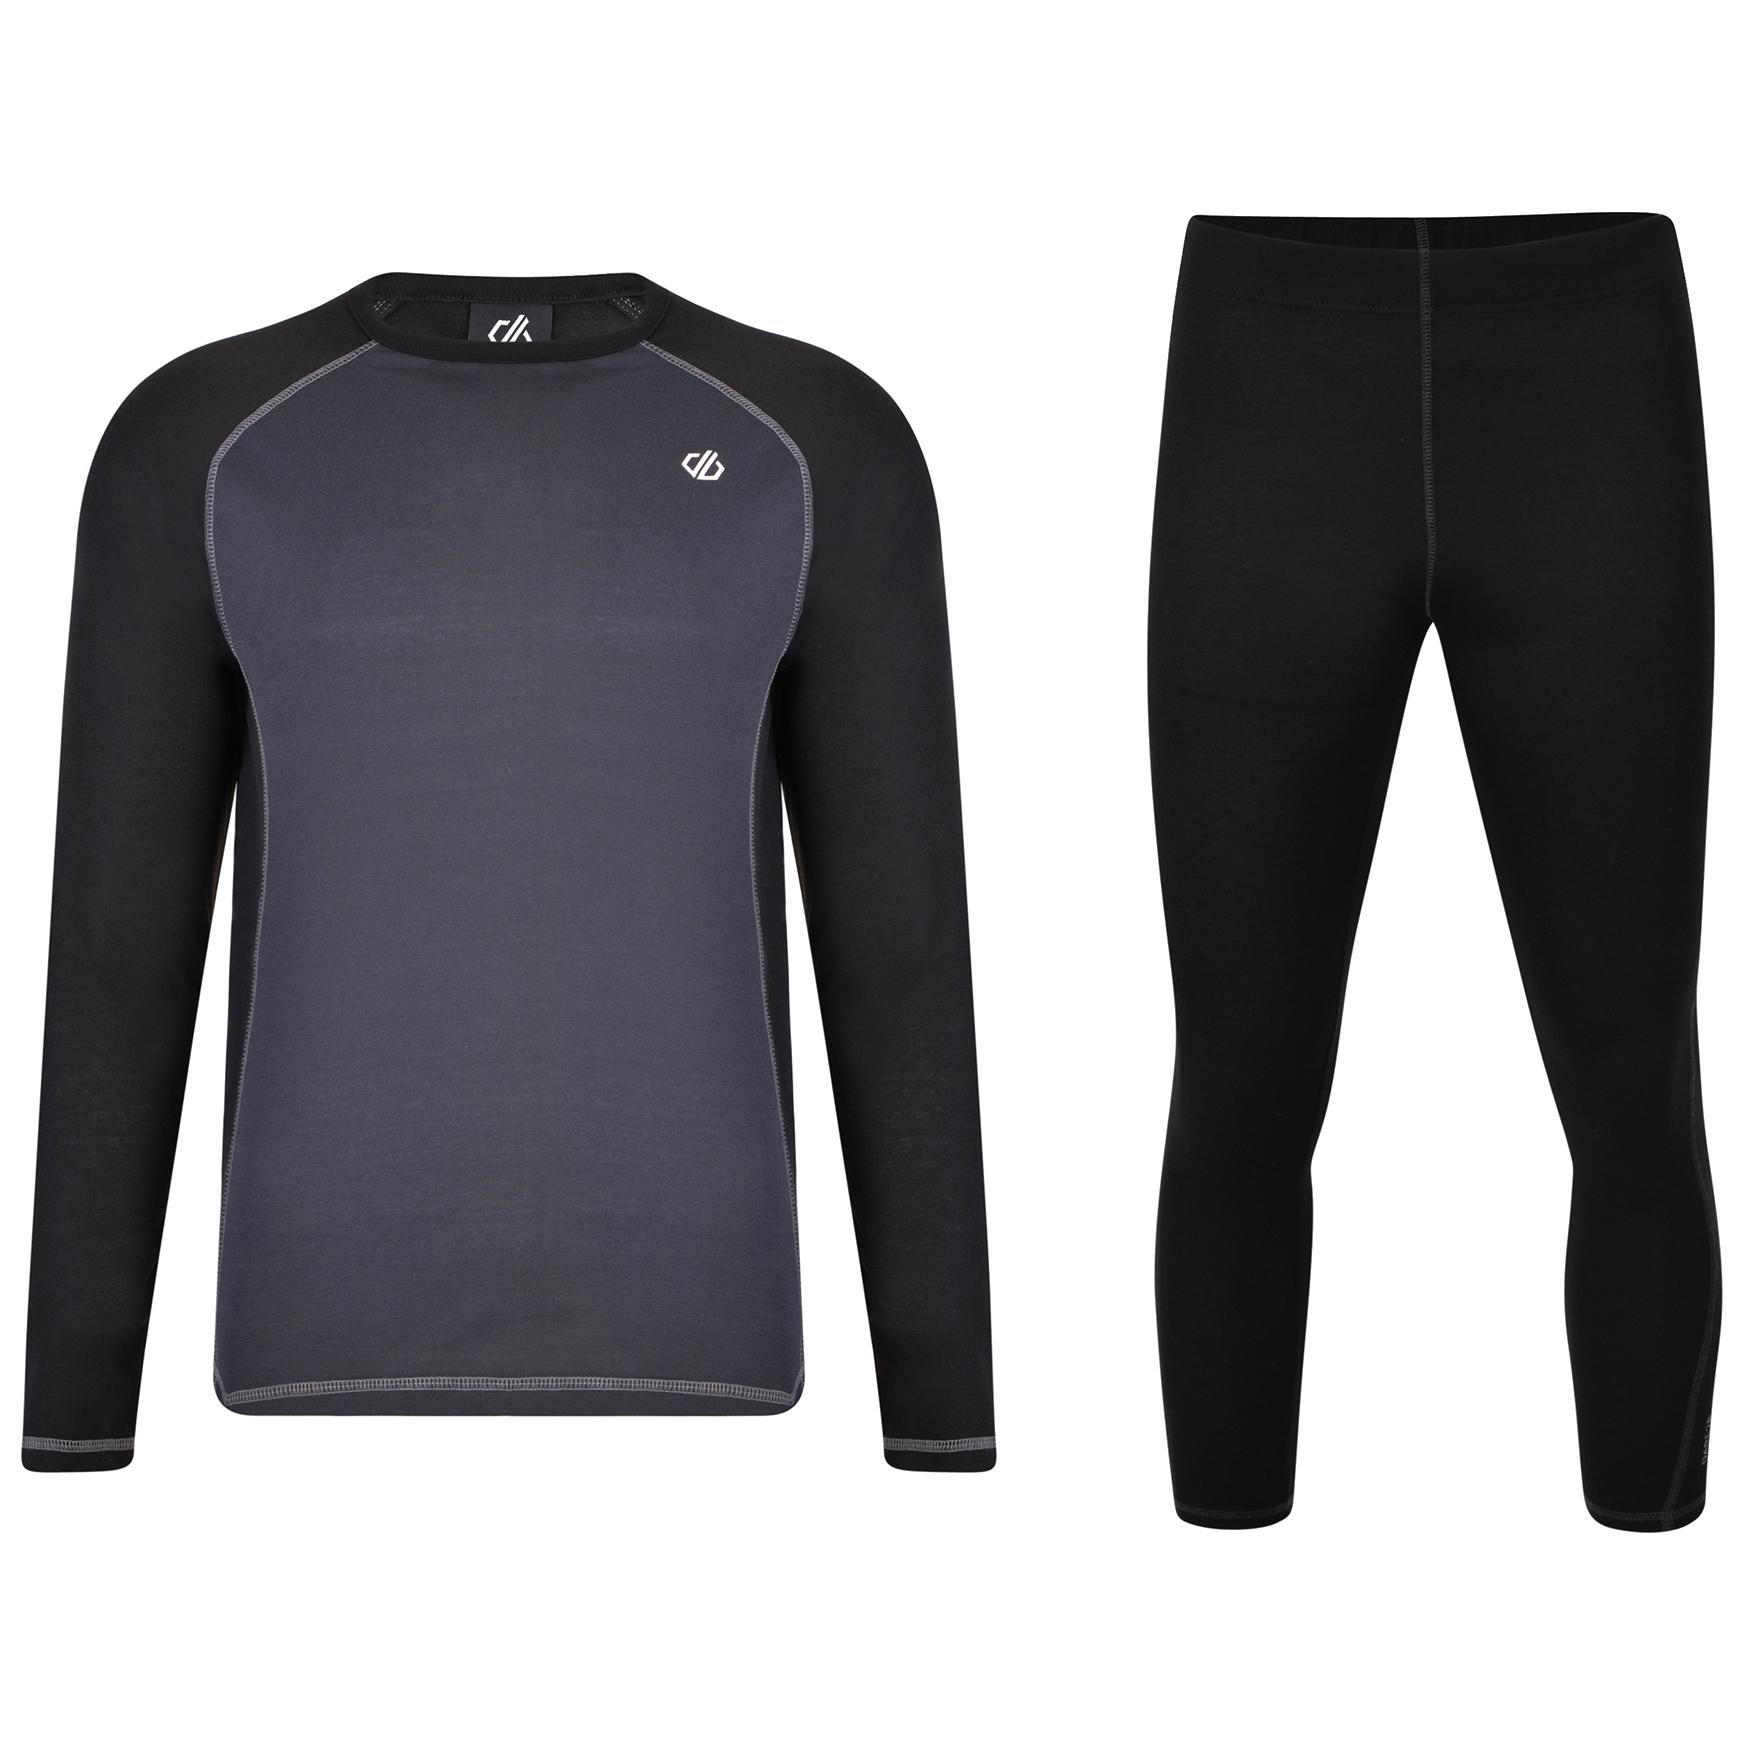 Dare 2b Exchange Base Layer Underwear Set - 06N Black/Ebony Grey